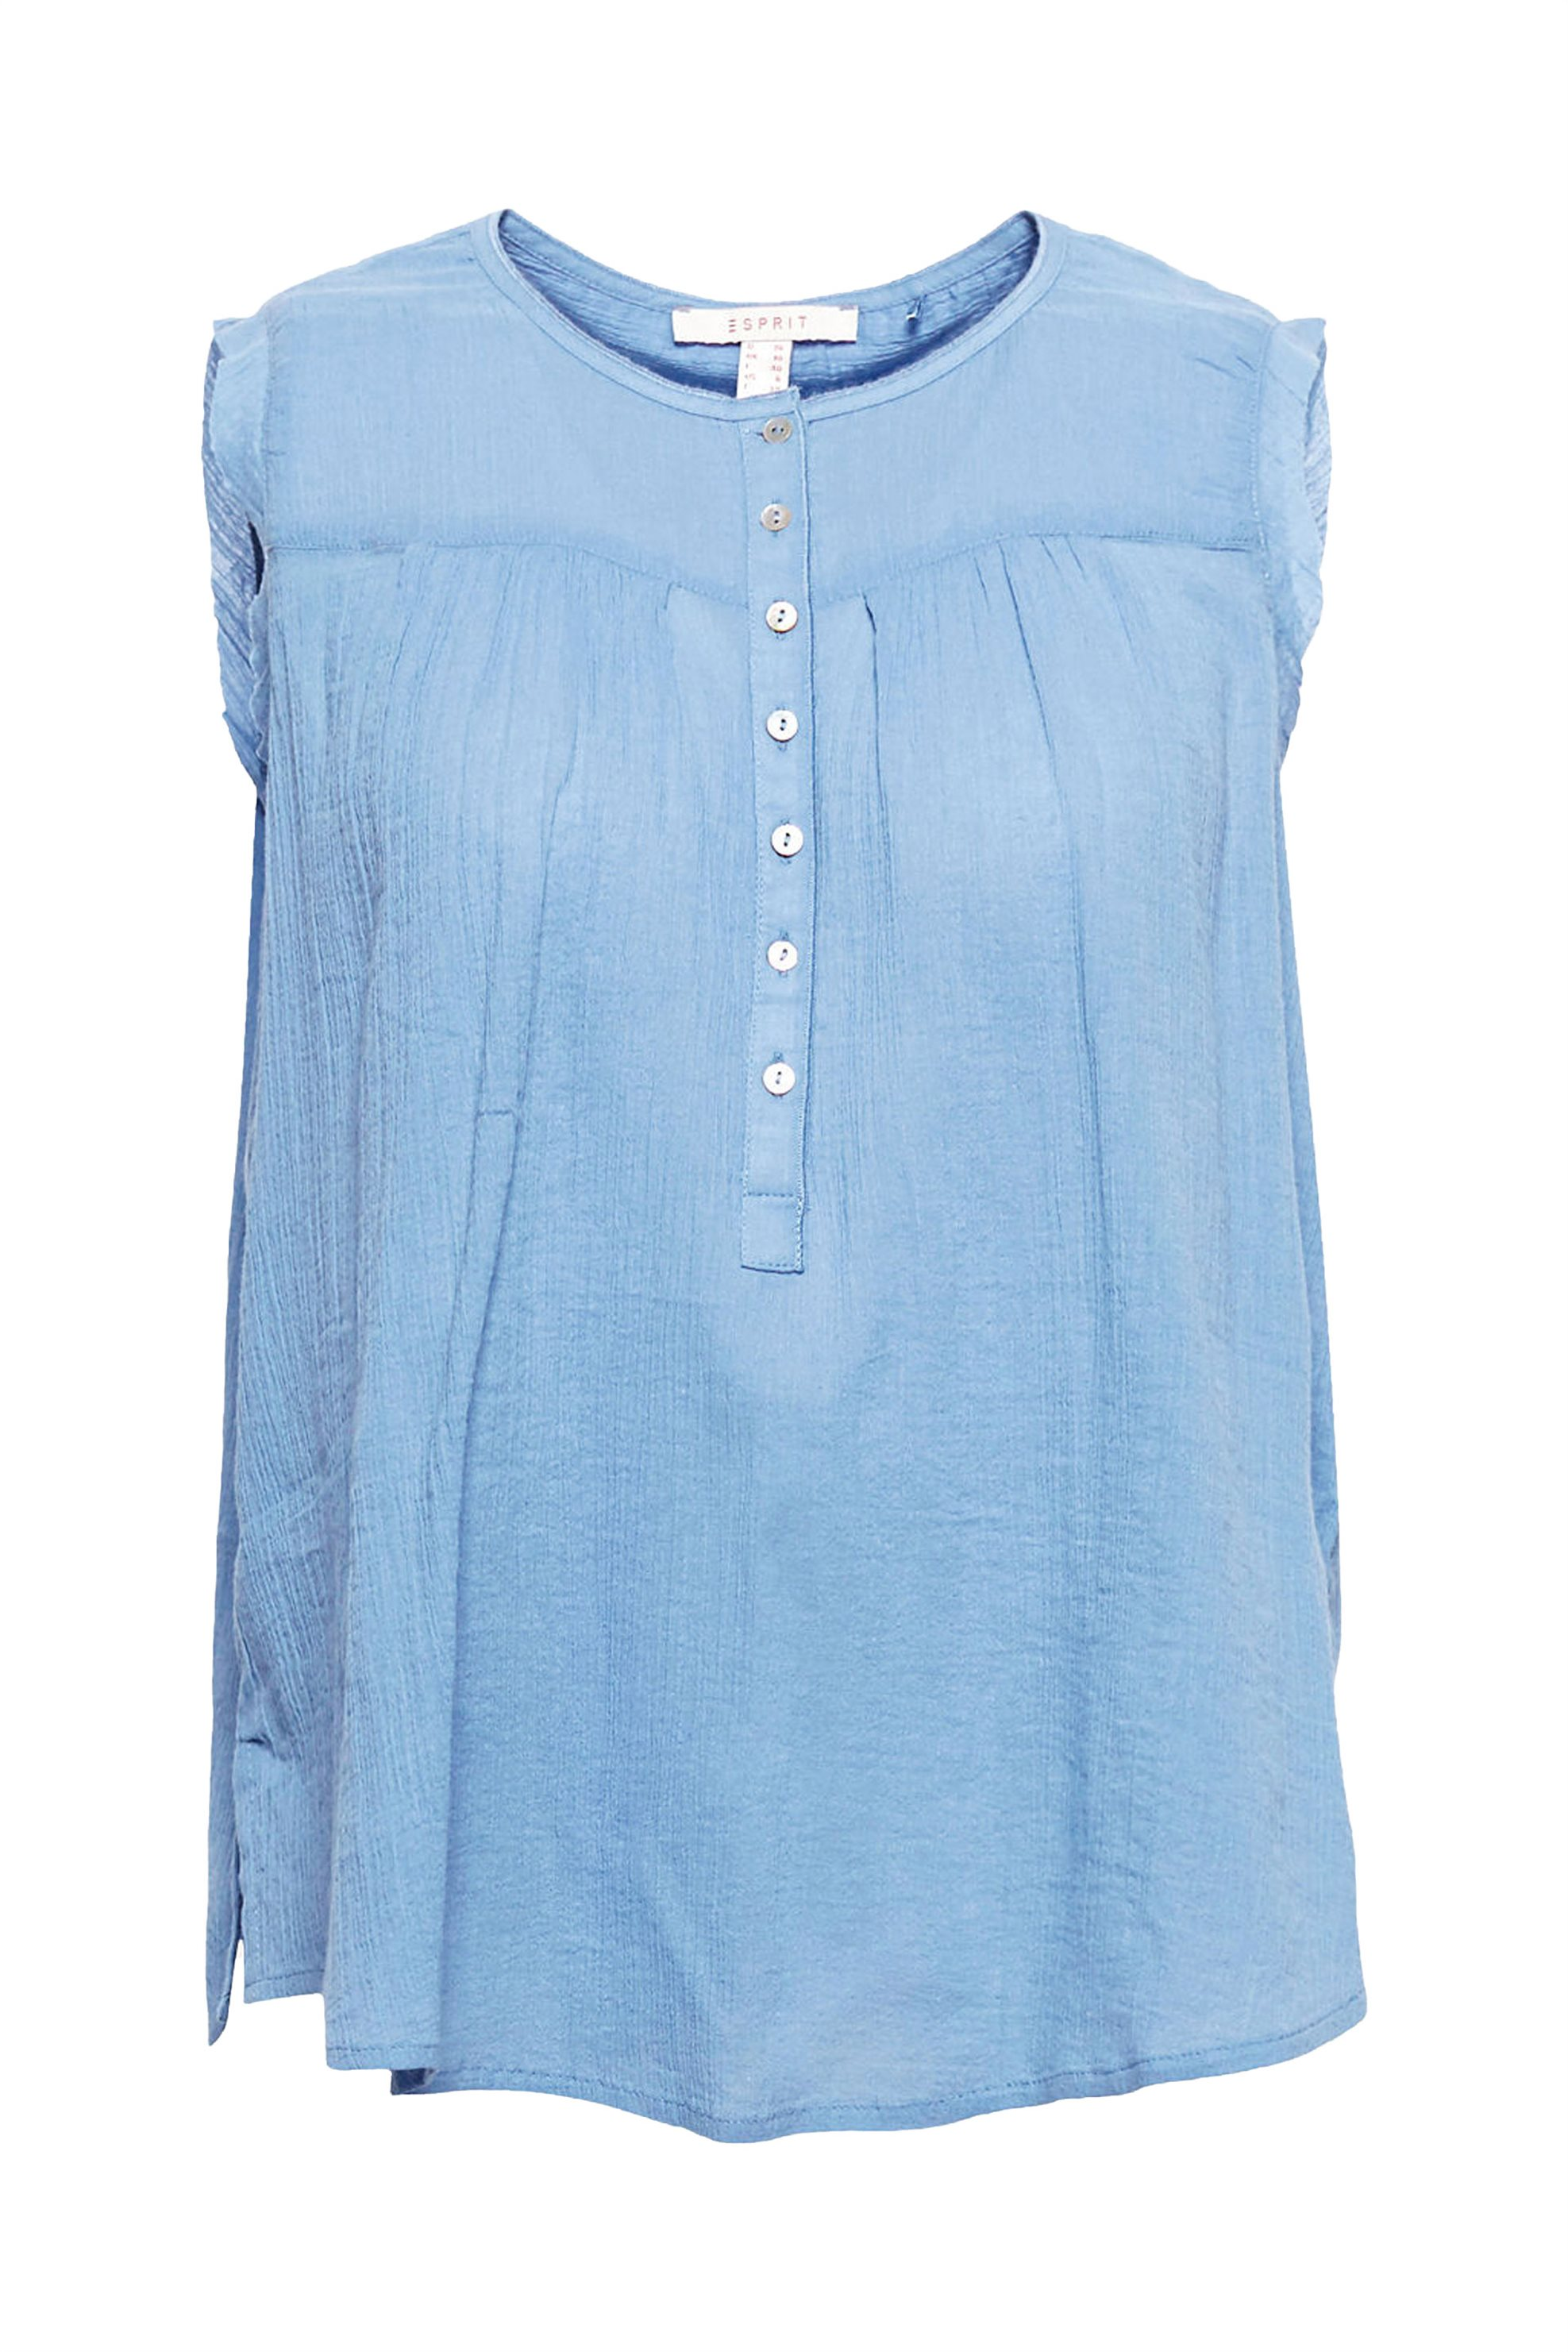 Update   Esprit γυναικεία μπλούζα αμάνικη - 058EE1F022 - Μπλε ... 6559567fe6d